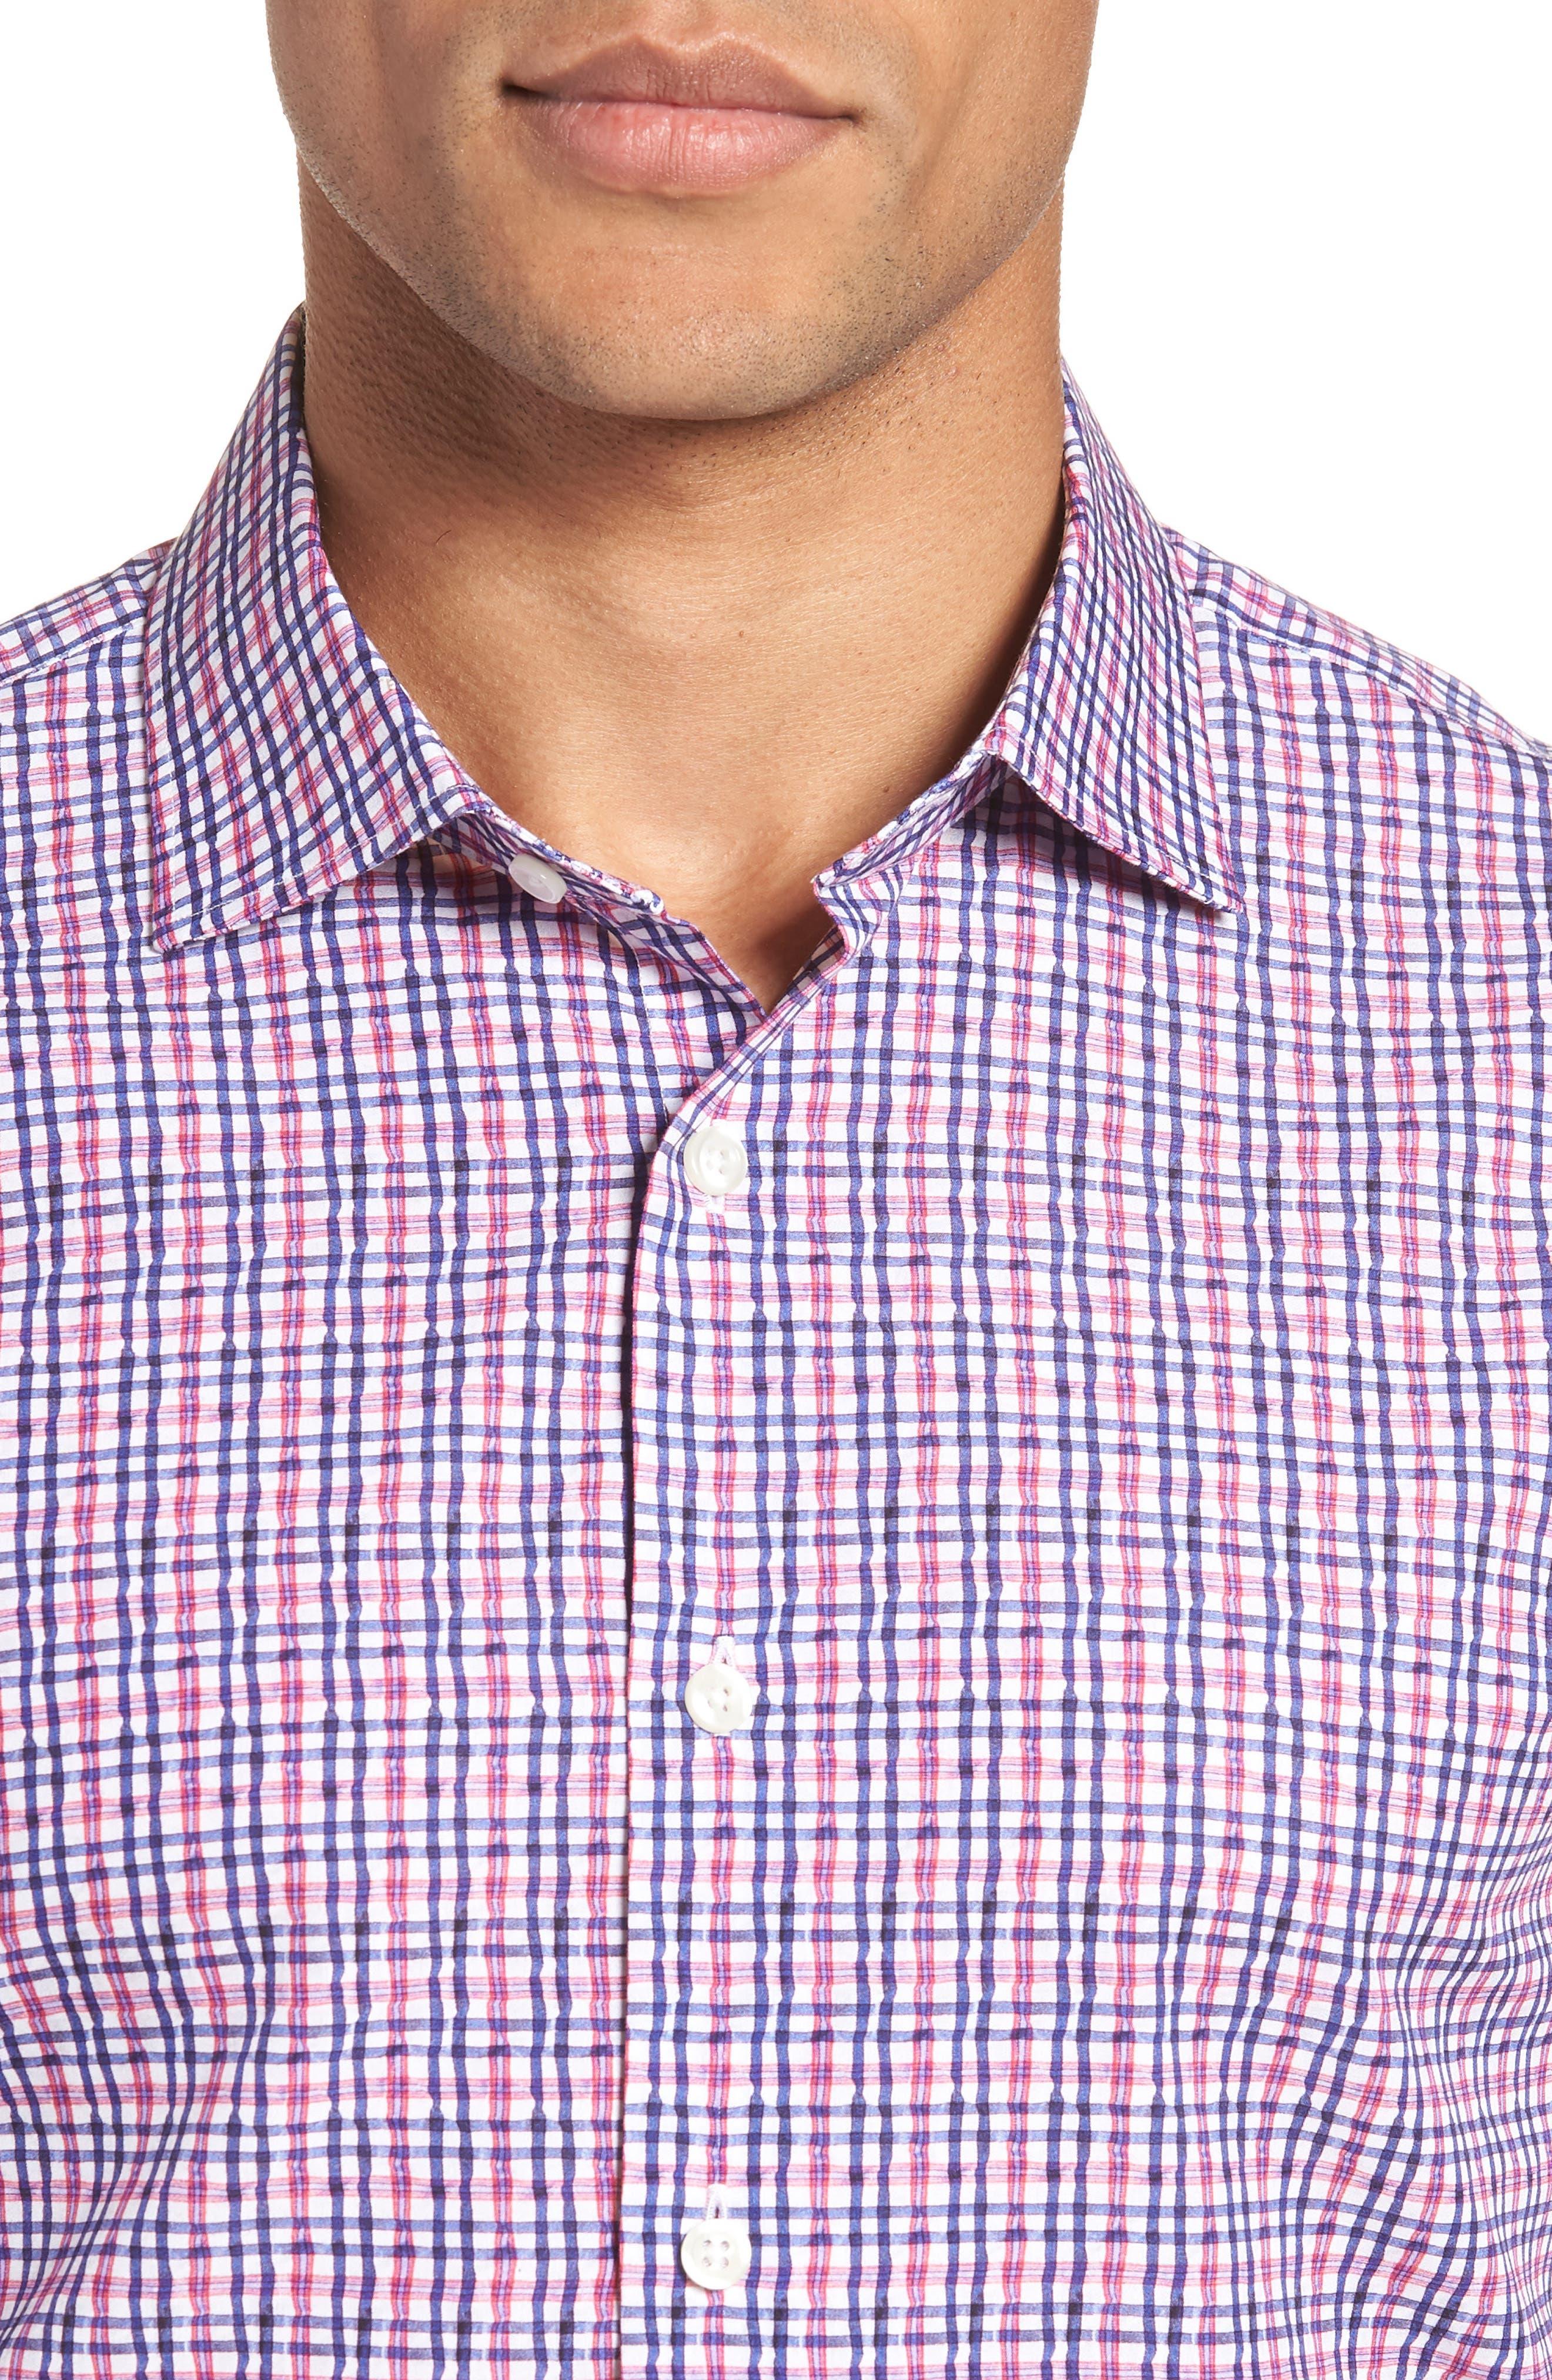 Trim Fit Plaid Dress Shirt,                             Alternate thumbnail 2, color,                             Pink Raspberry